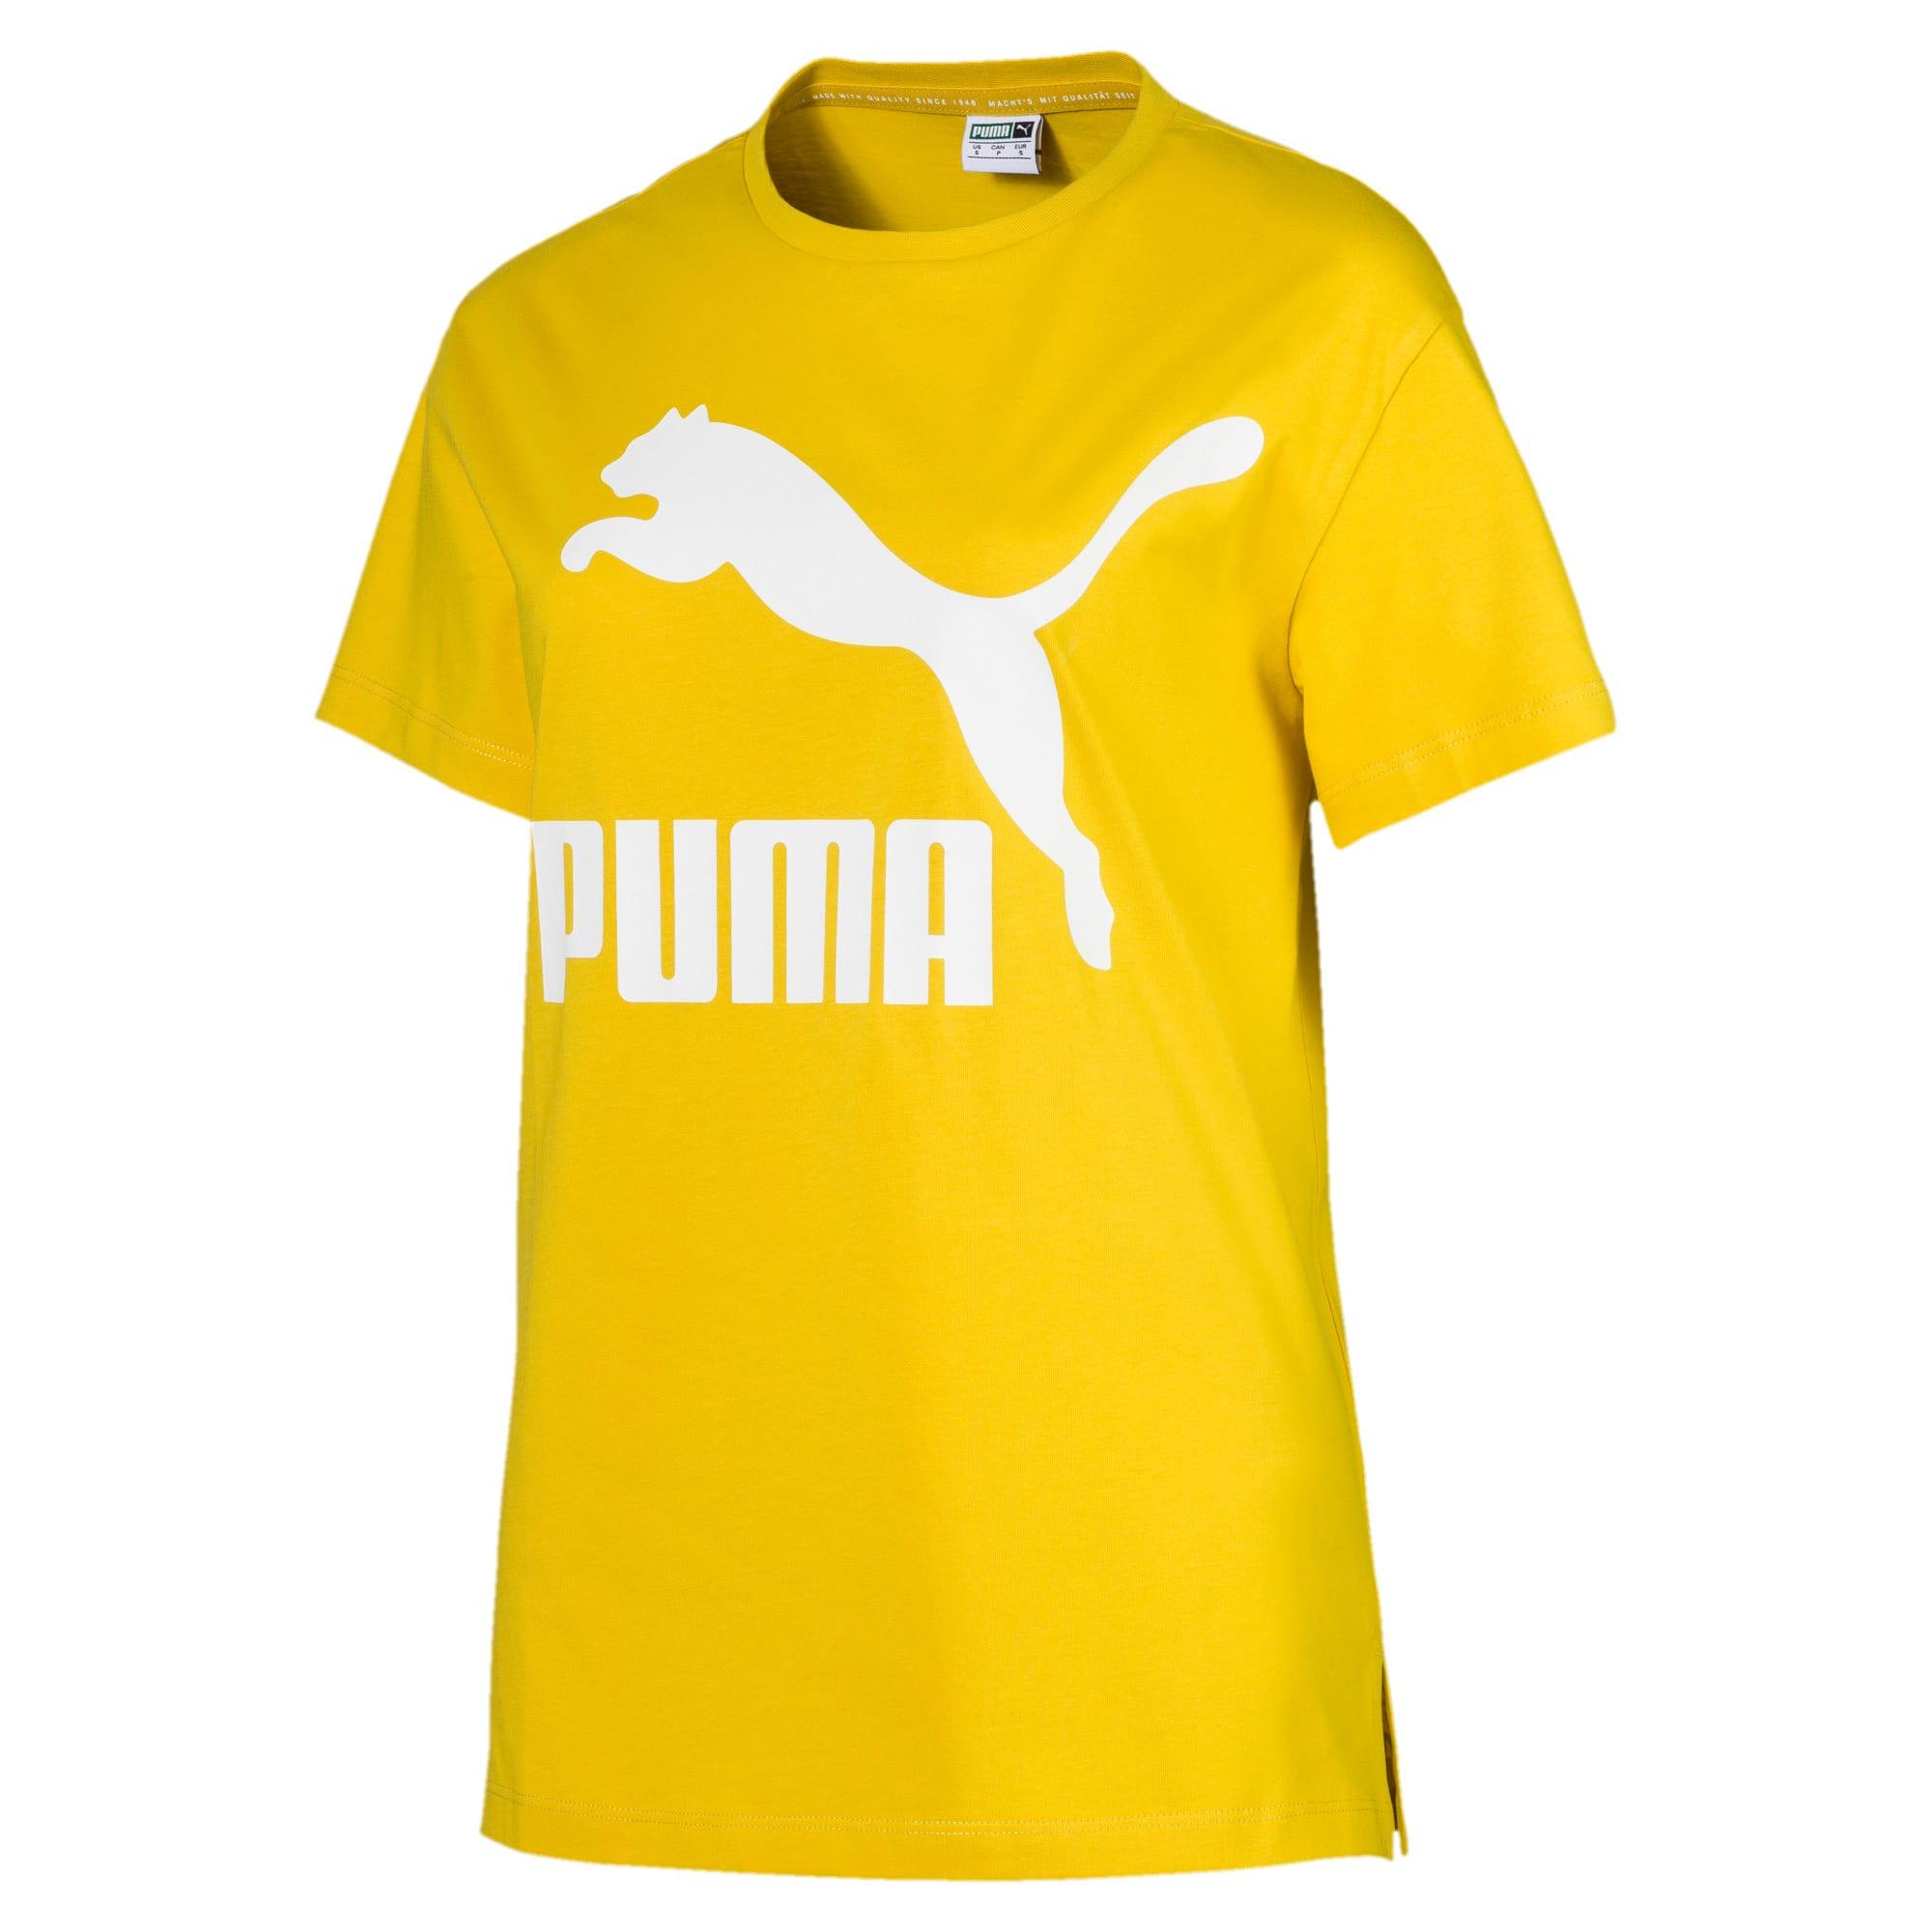 Miniatura 4 de Camiseta Classics con logotipo para mujer, Sulphur, mediano